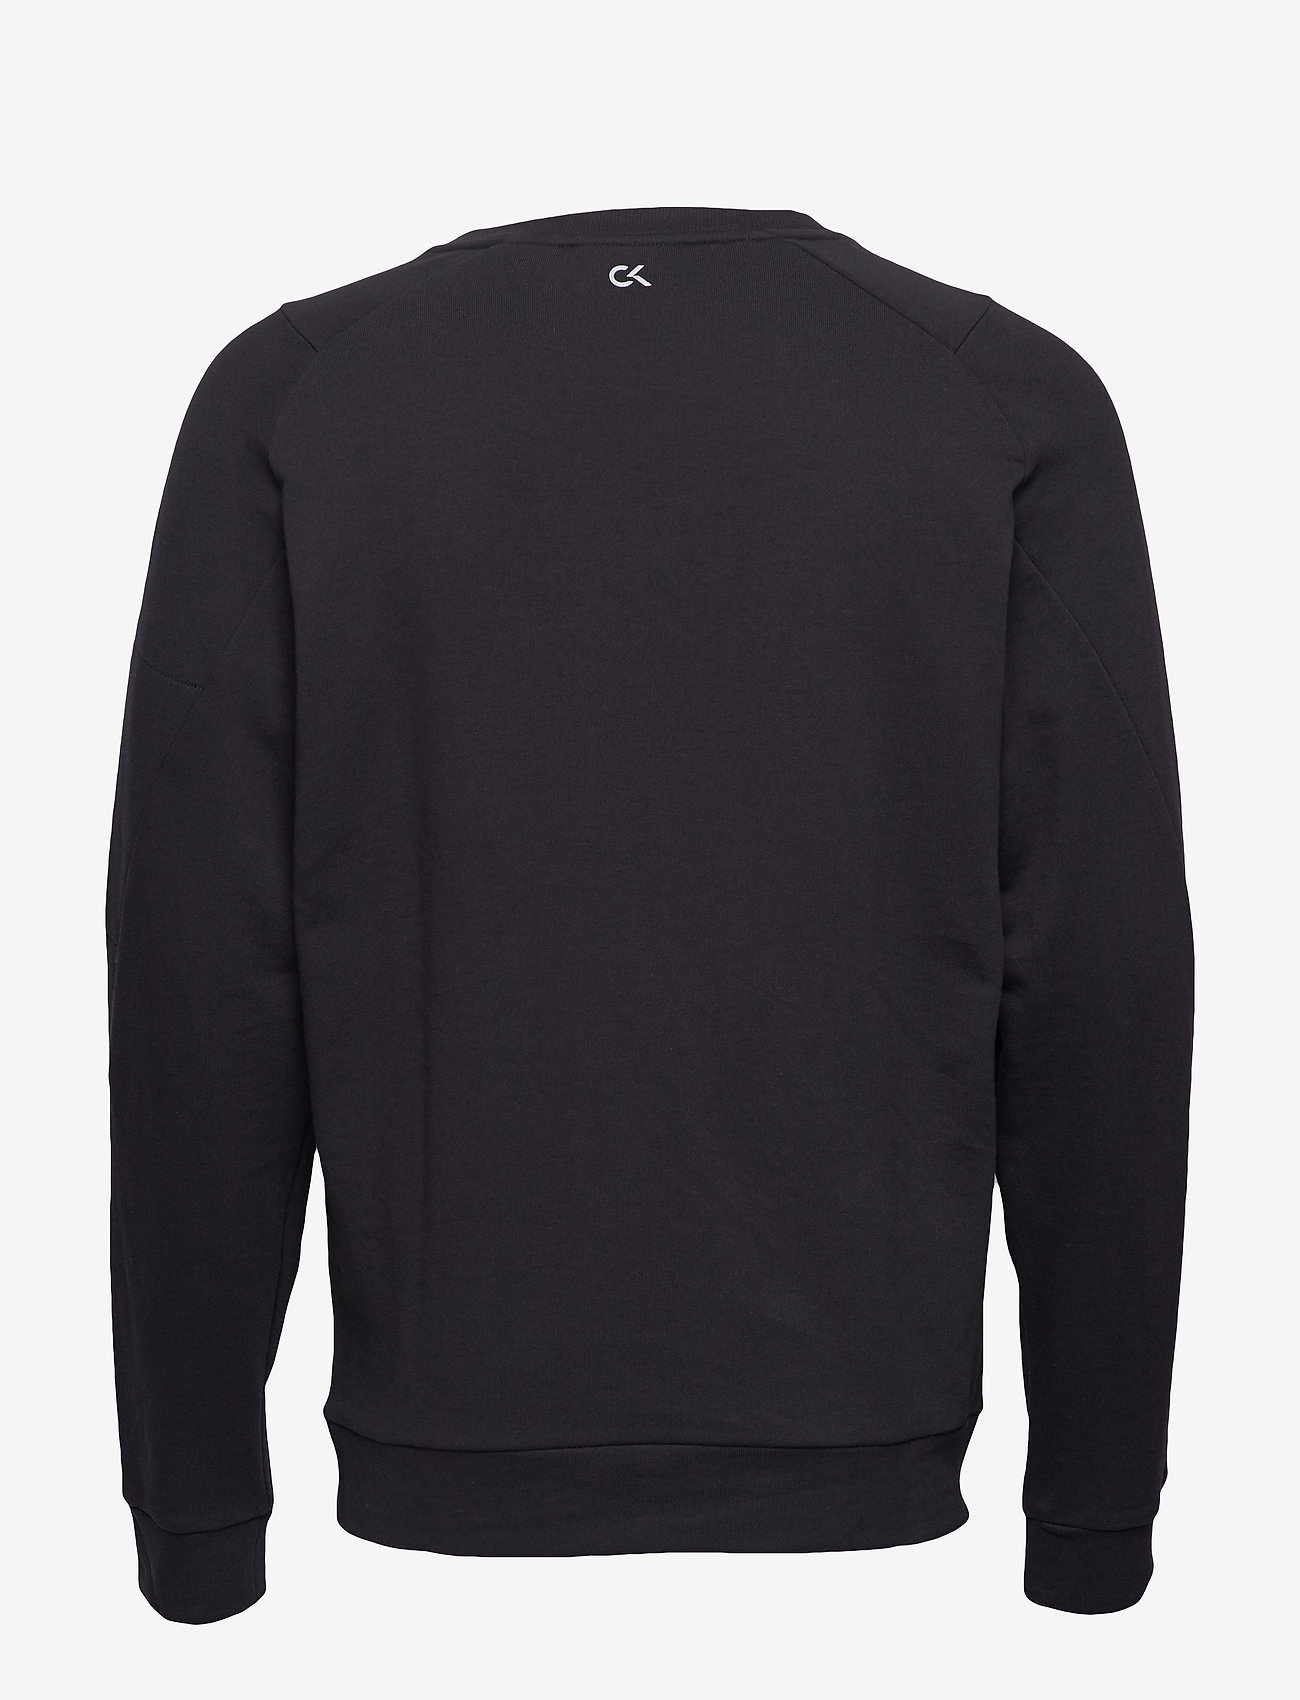 Pullover (Ck Black) - Calvin Klein Performance BqNlql